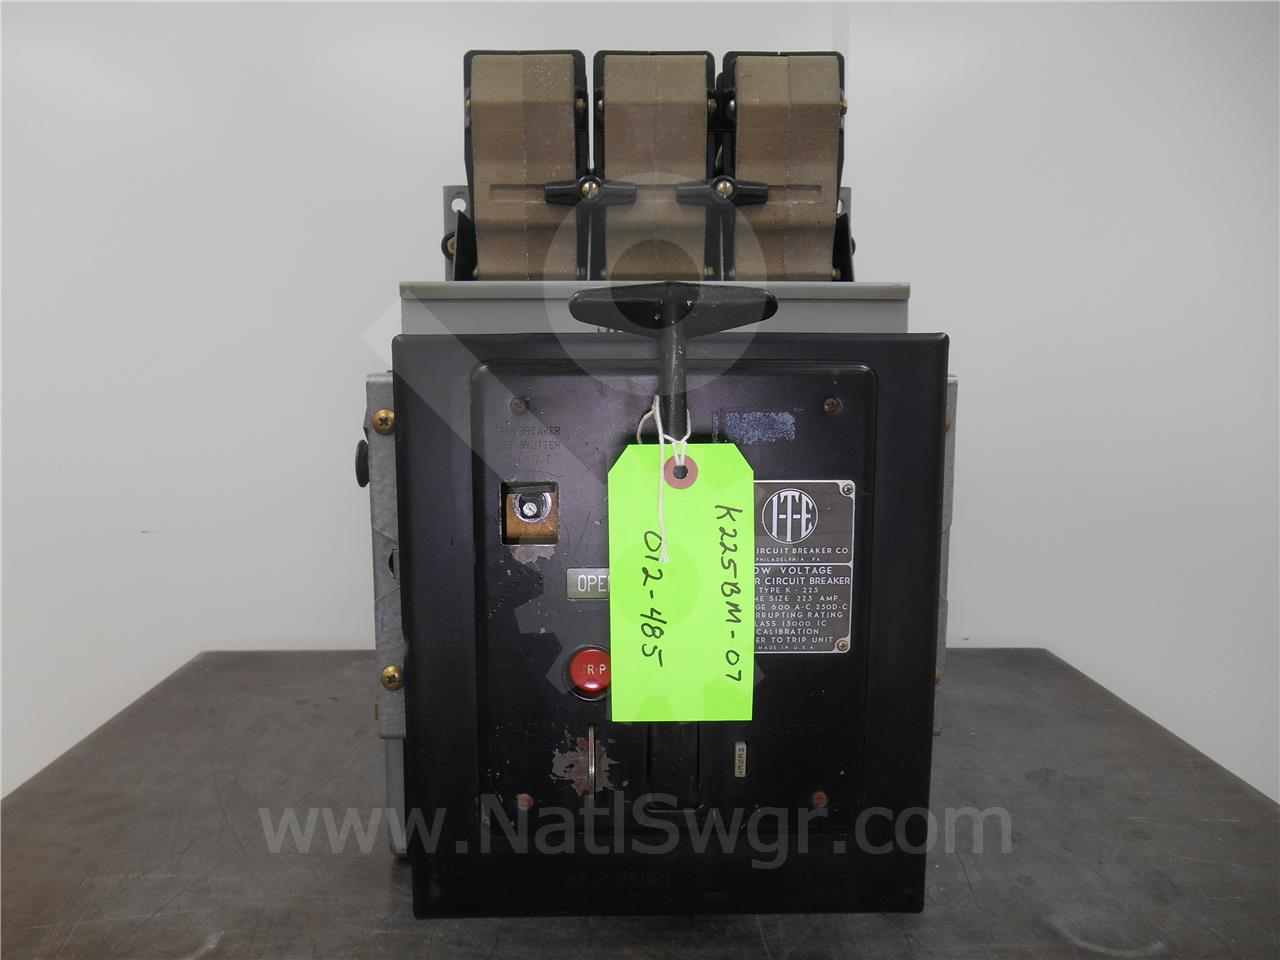 K 225 225a Ite Black Mo Do Sku012485 Ebay Used Circuit Breakers E43b060 60 Amp 3 Pole Breaker Image Is Loading